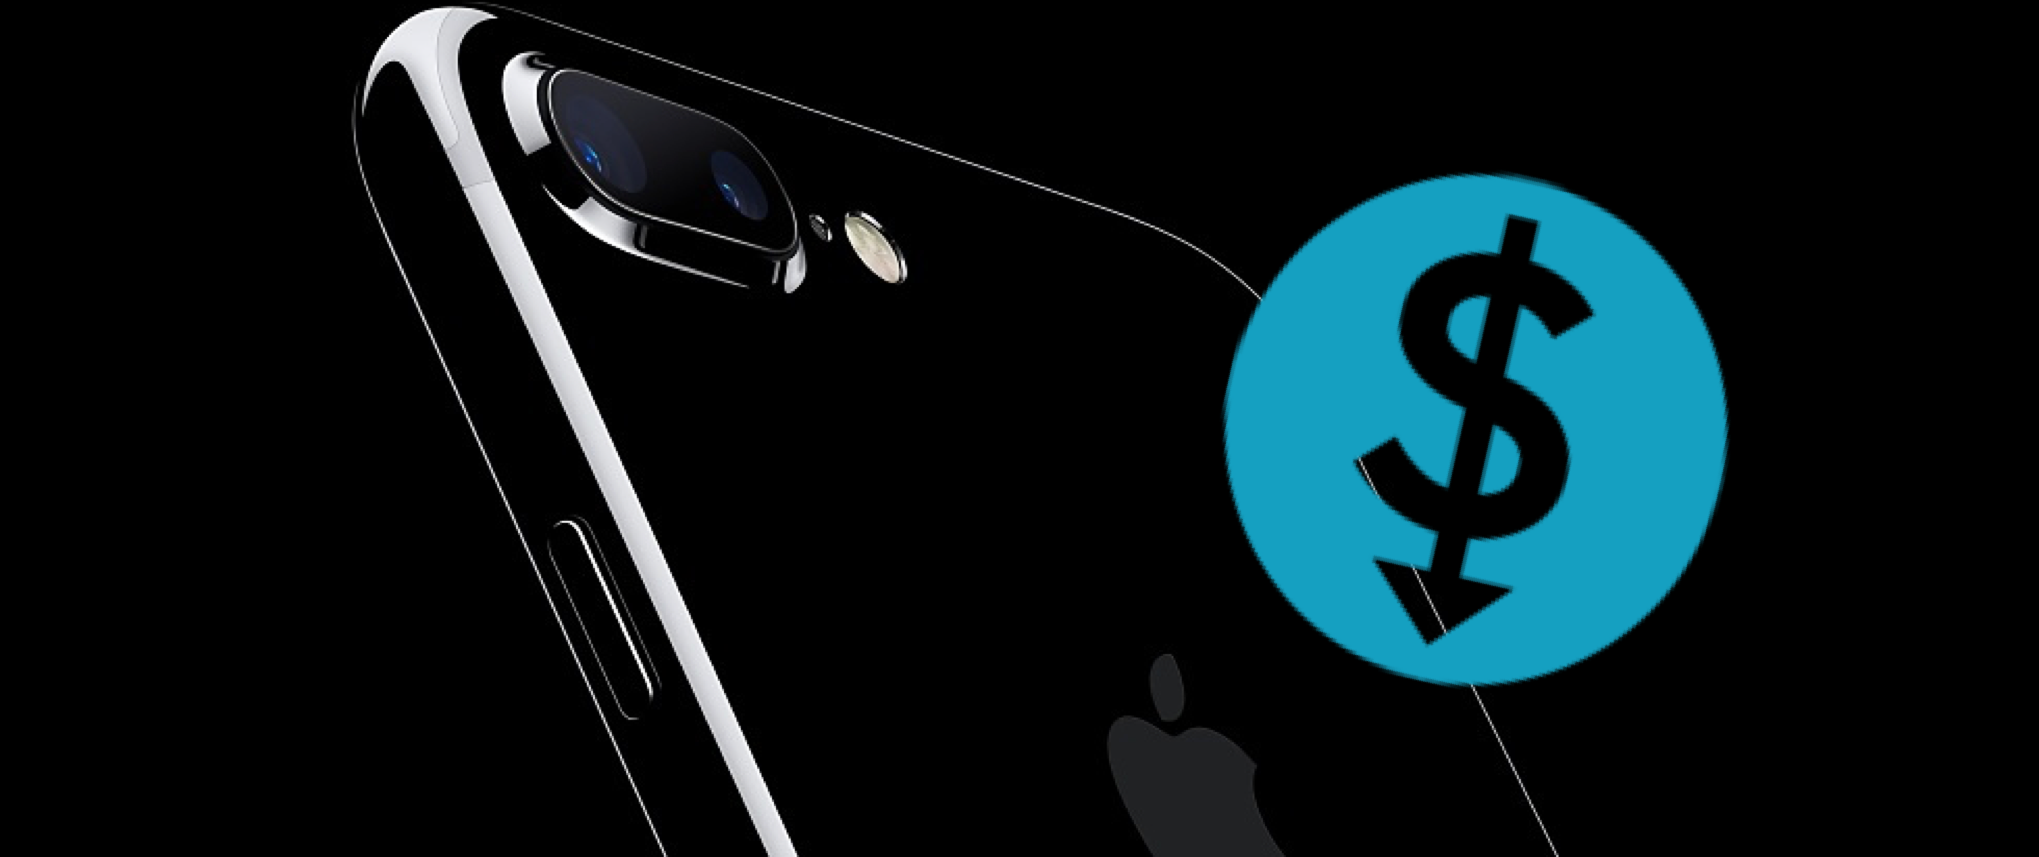 iphone 7 price drop.png